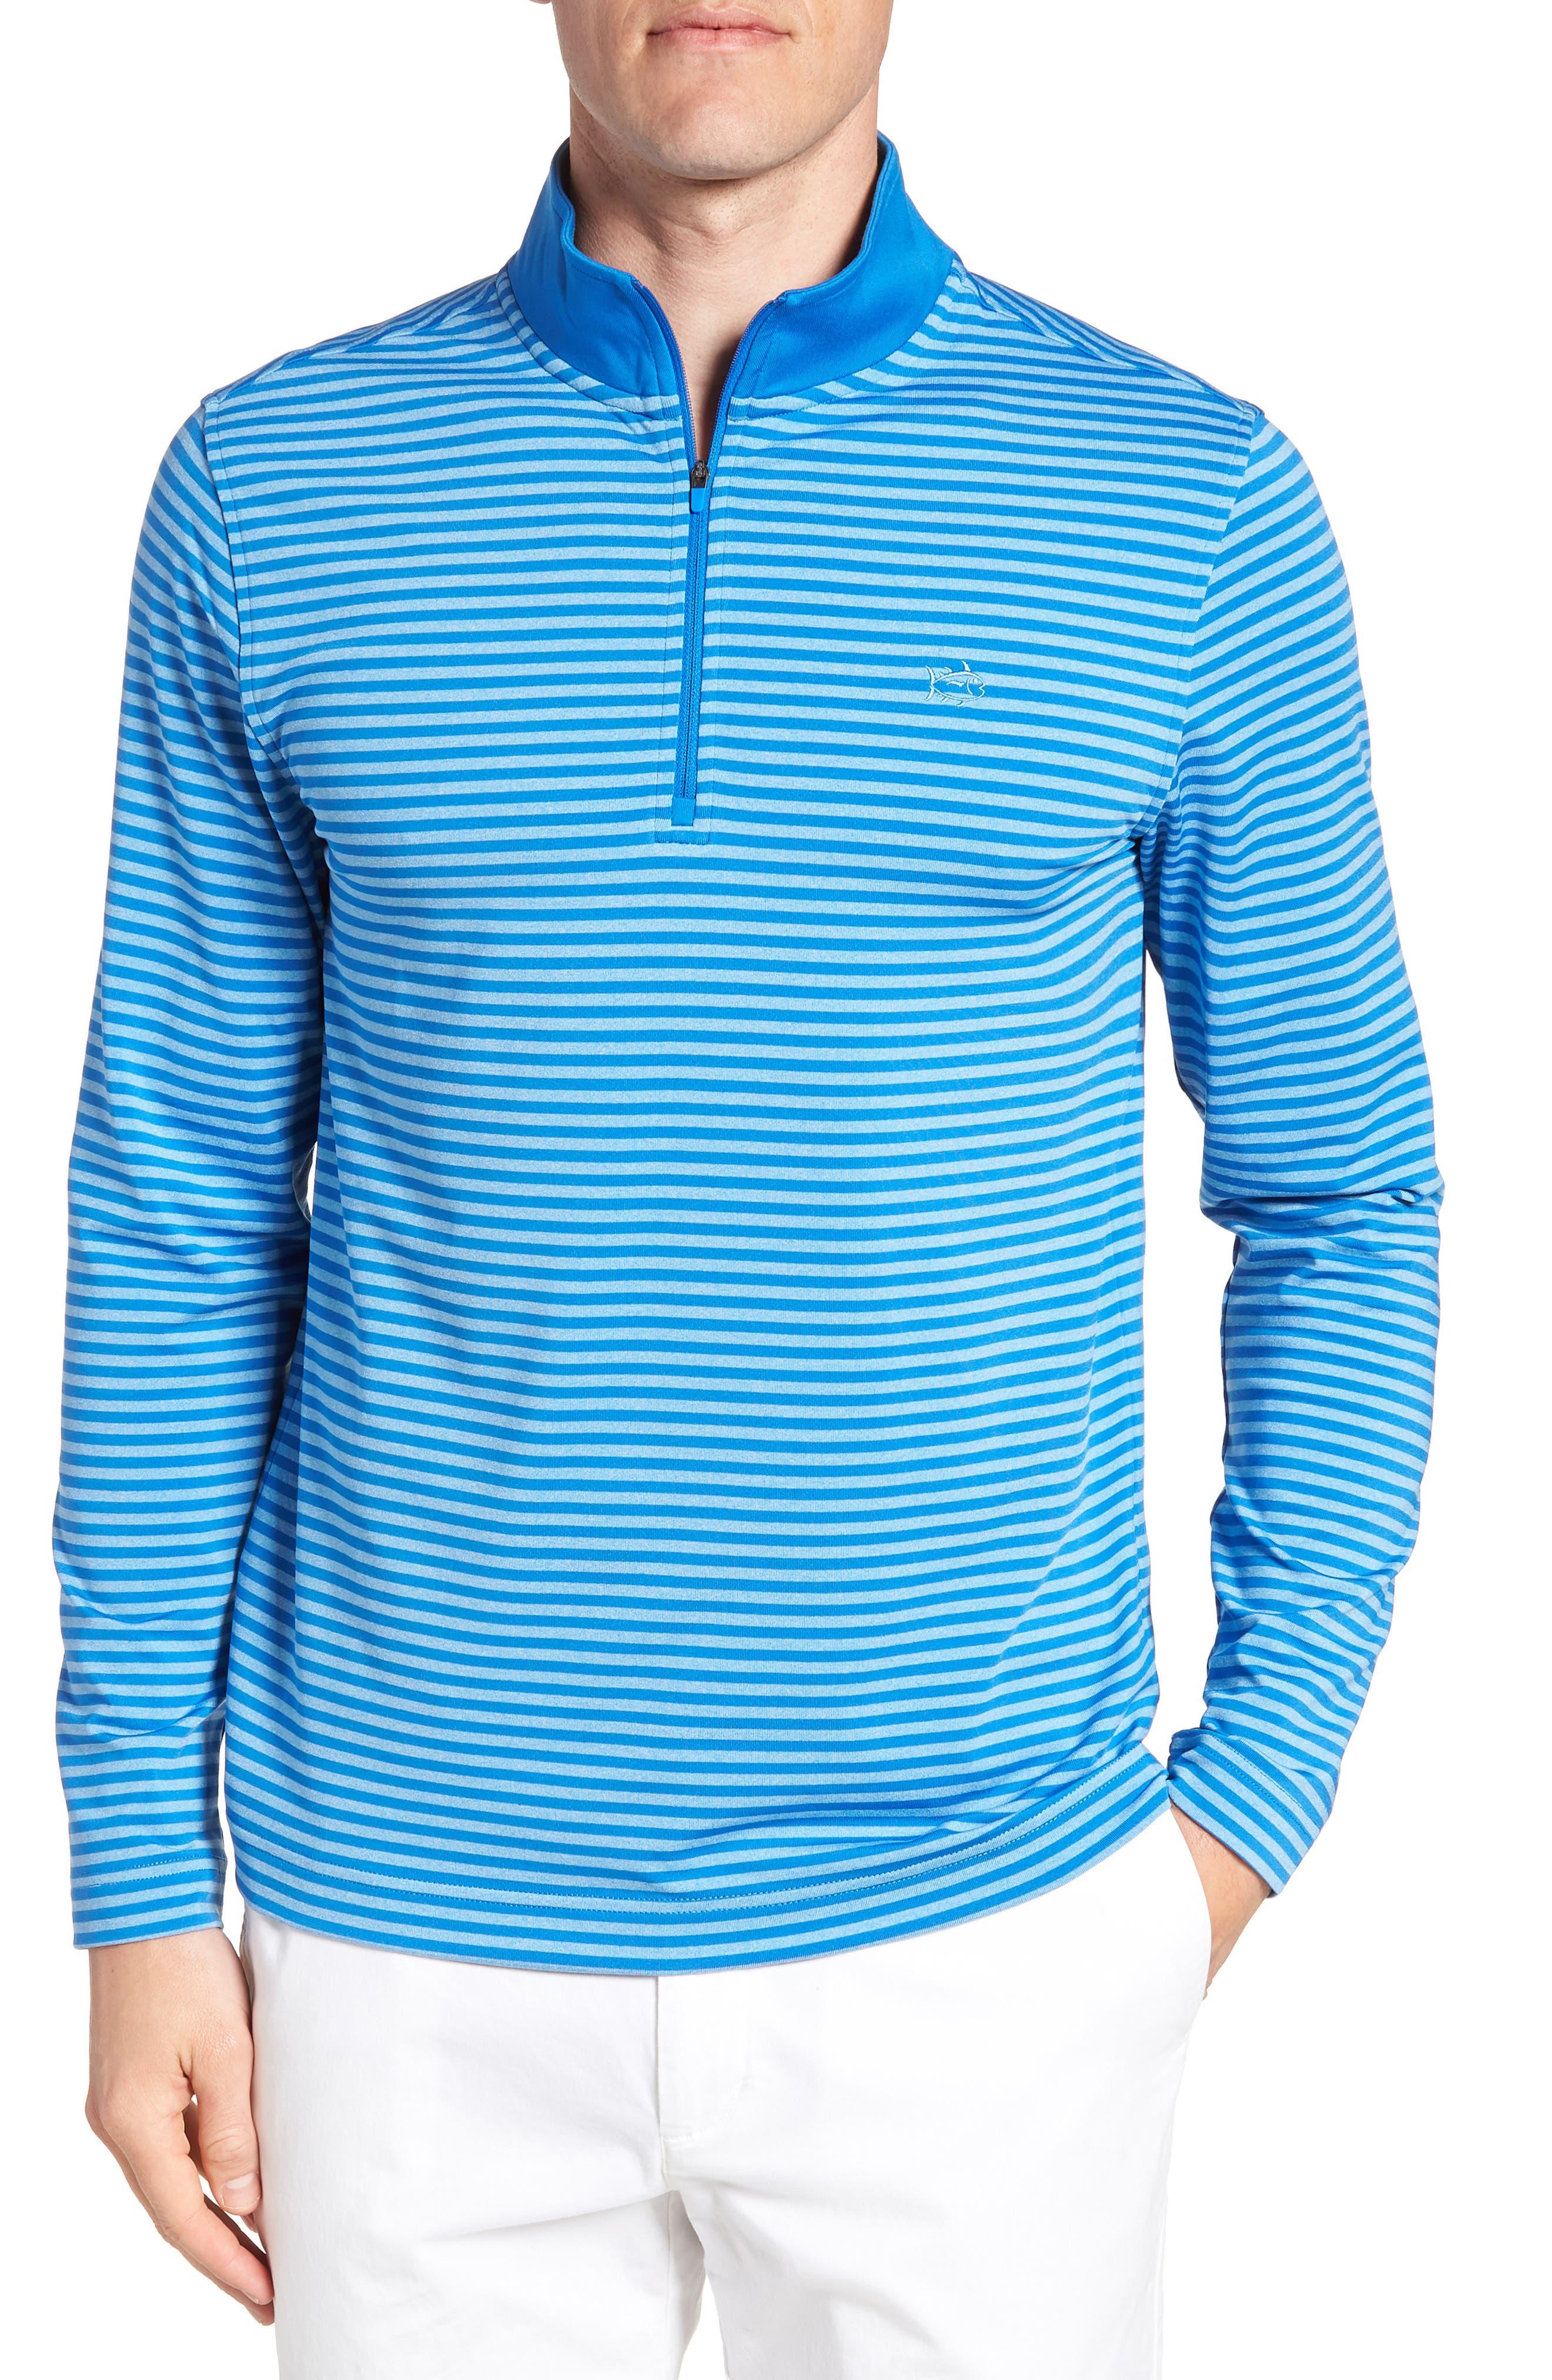 SOUTHERN TIDE,                             Stripe Quarter Zip Pullover,                             Main thumbnail 1, color,                             400